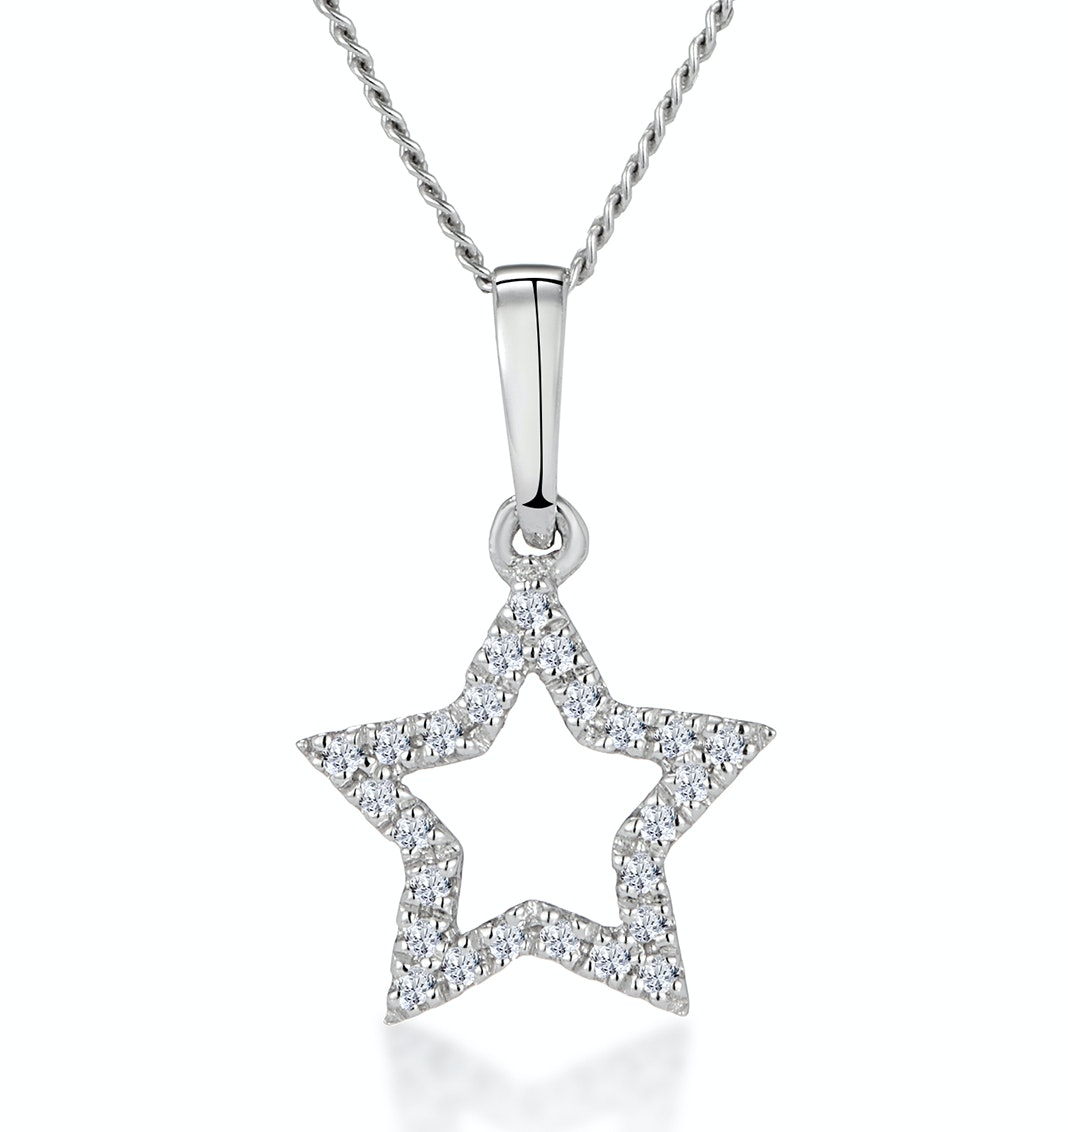 Stellato Diamond Star Necklace in 9K White Gold